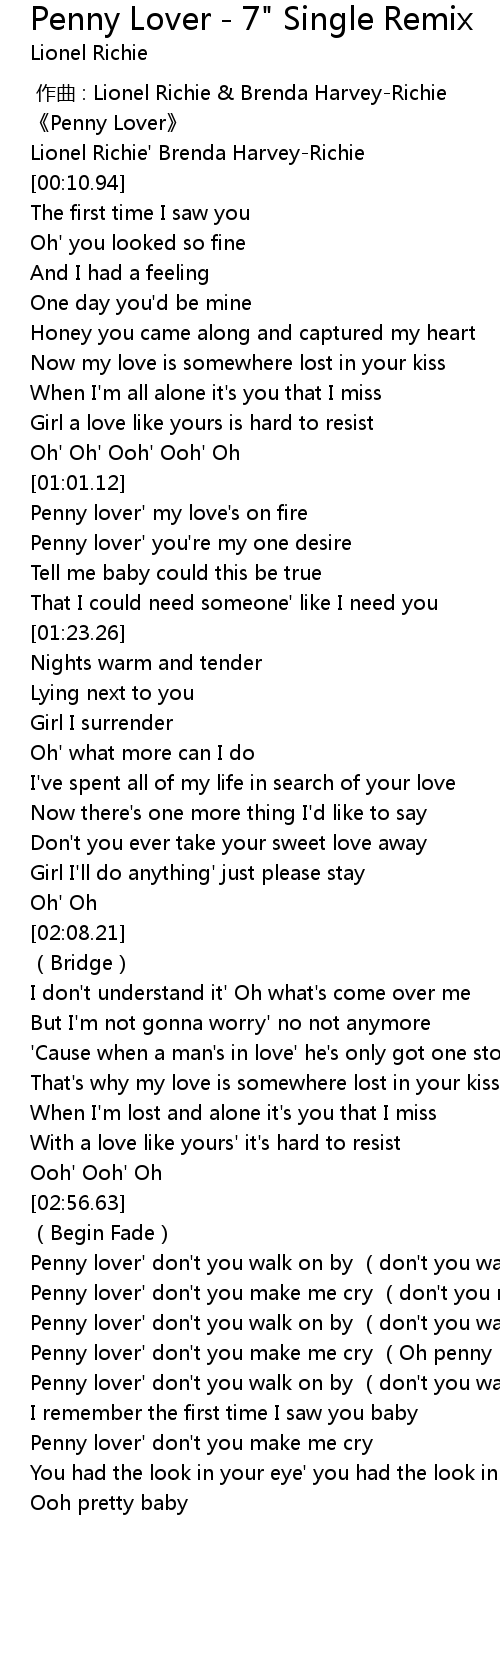 Ooh Baby I Need You In My Life Lyrics : lyrics, Penny, Lover, Single, Remix, Lyrics, Follow